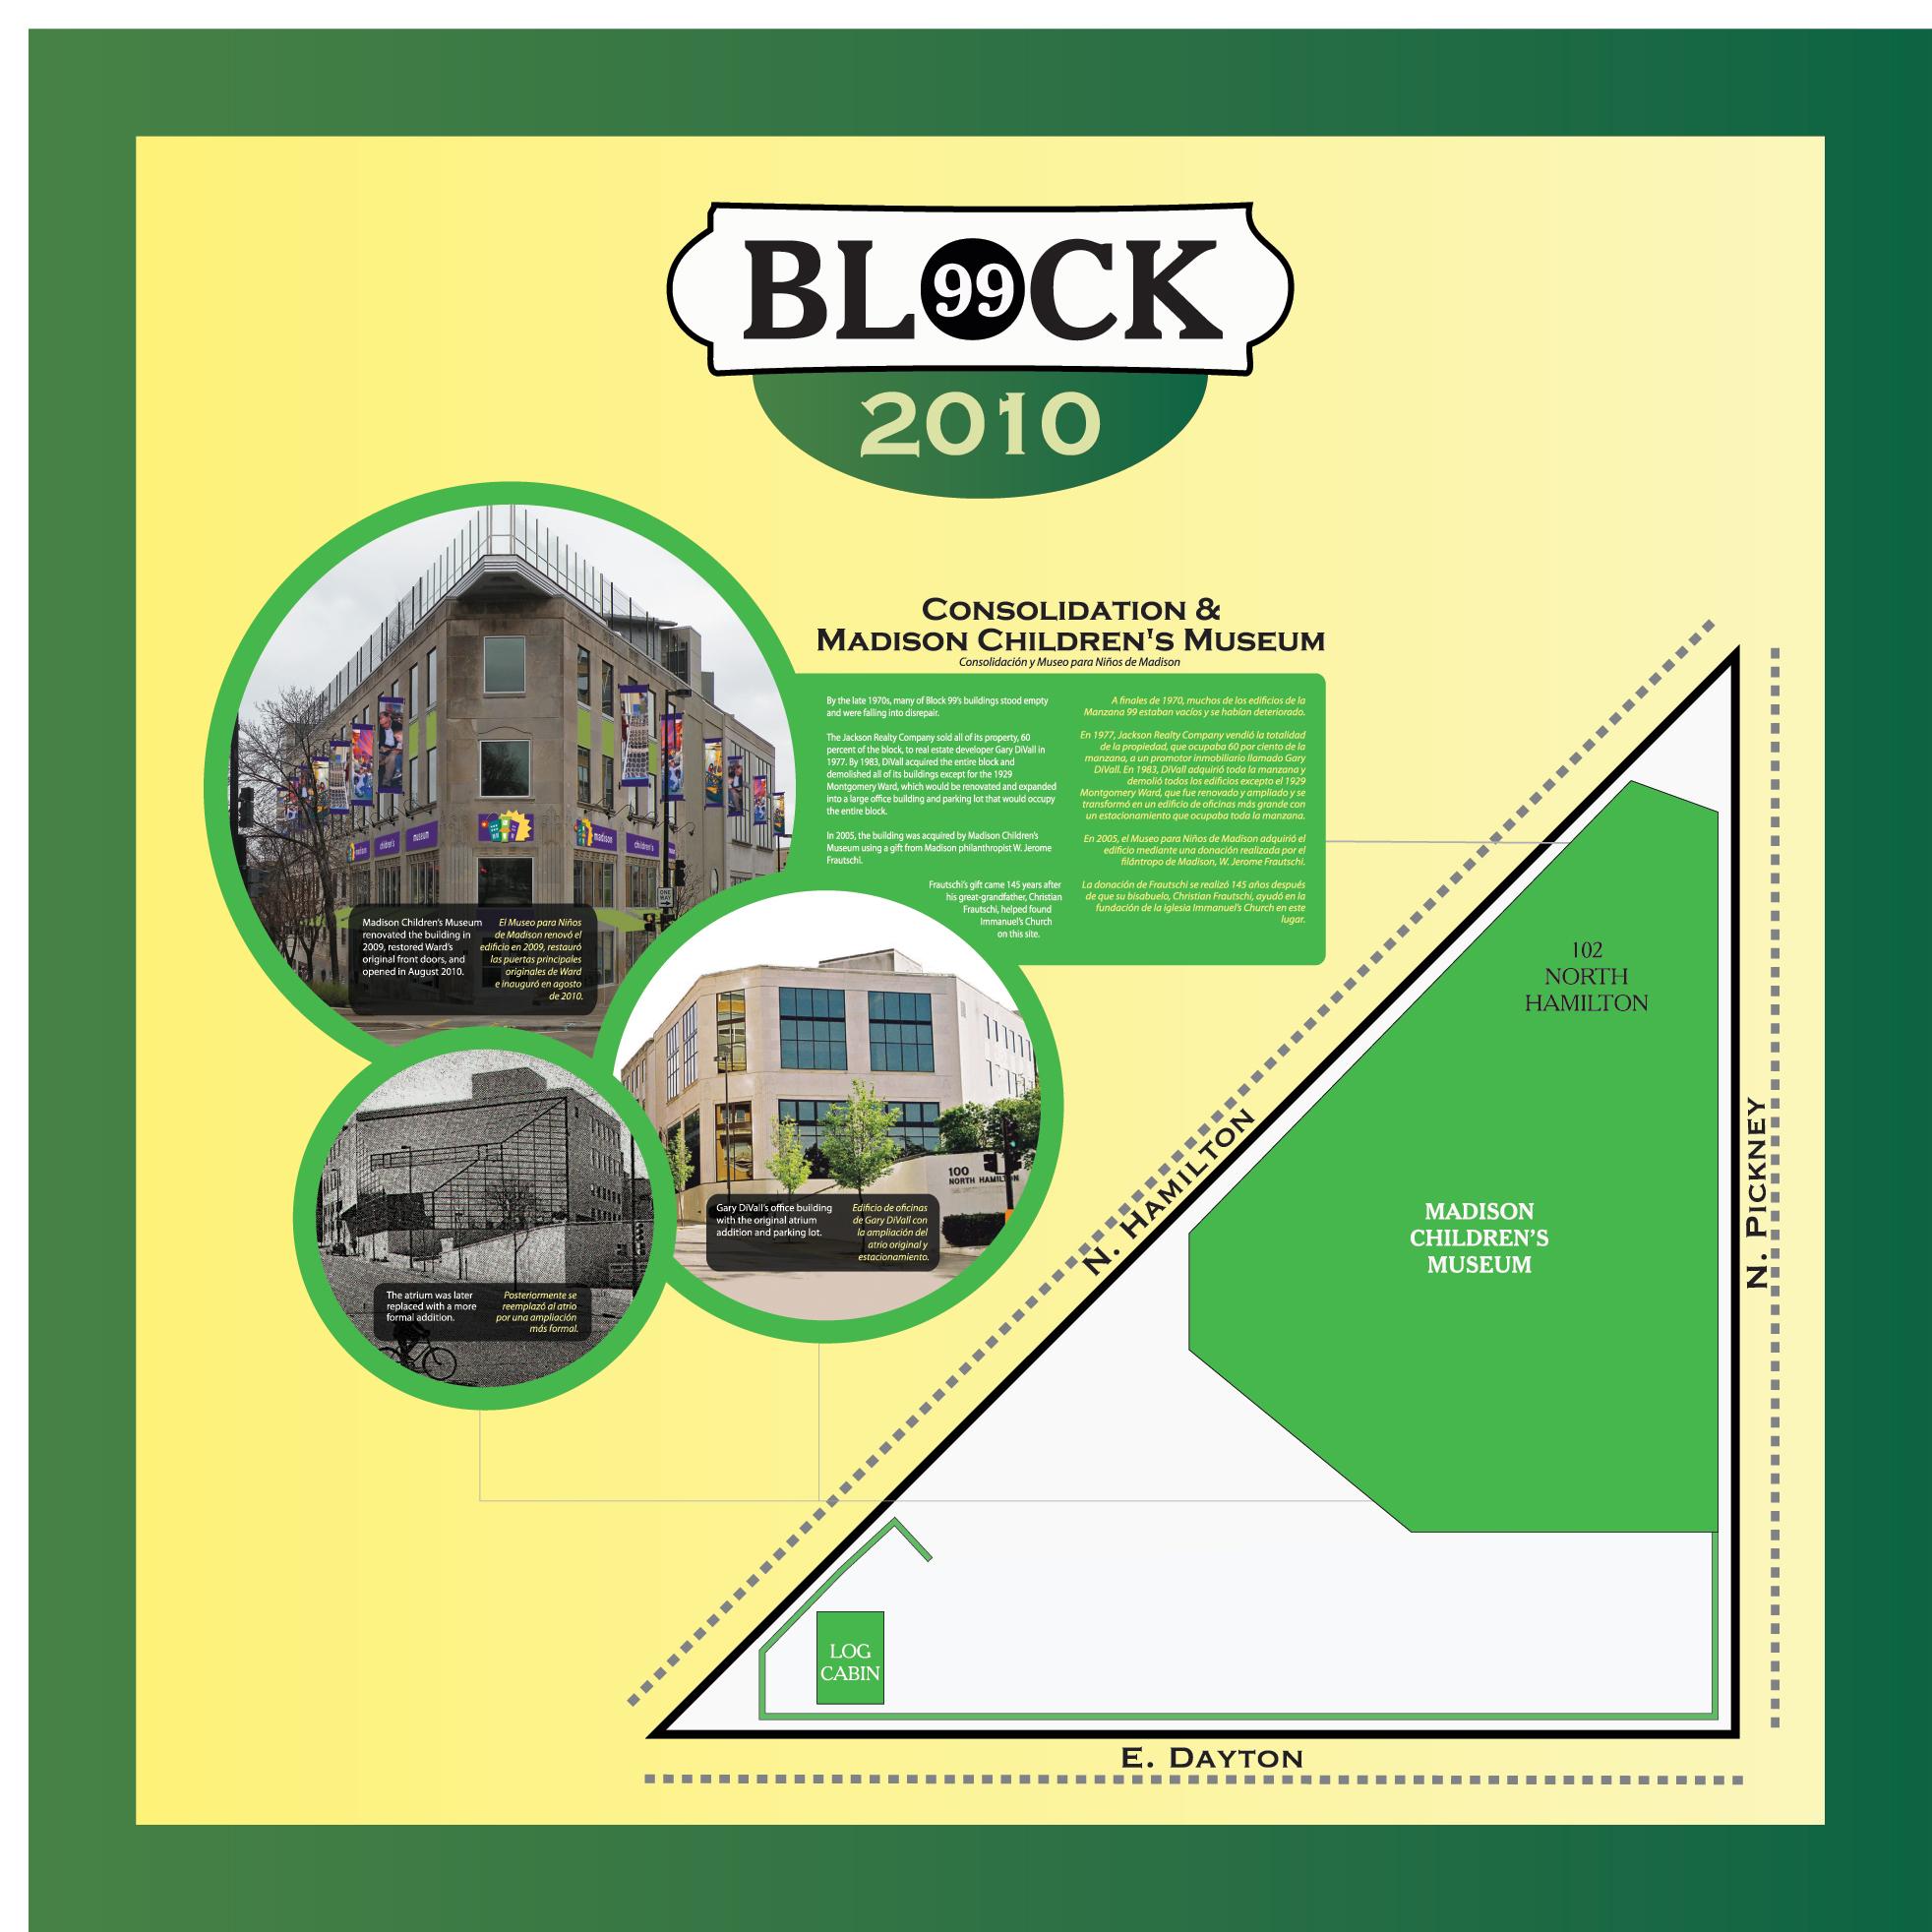 BLOCK_99_Panels_FINAL-DRAFT-UPDATE-panel6.jpg